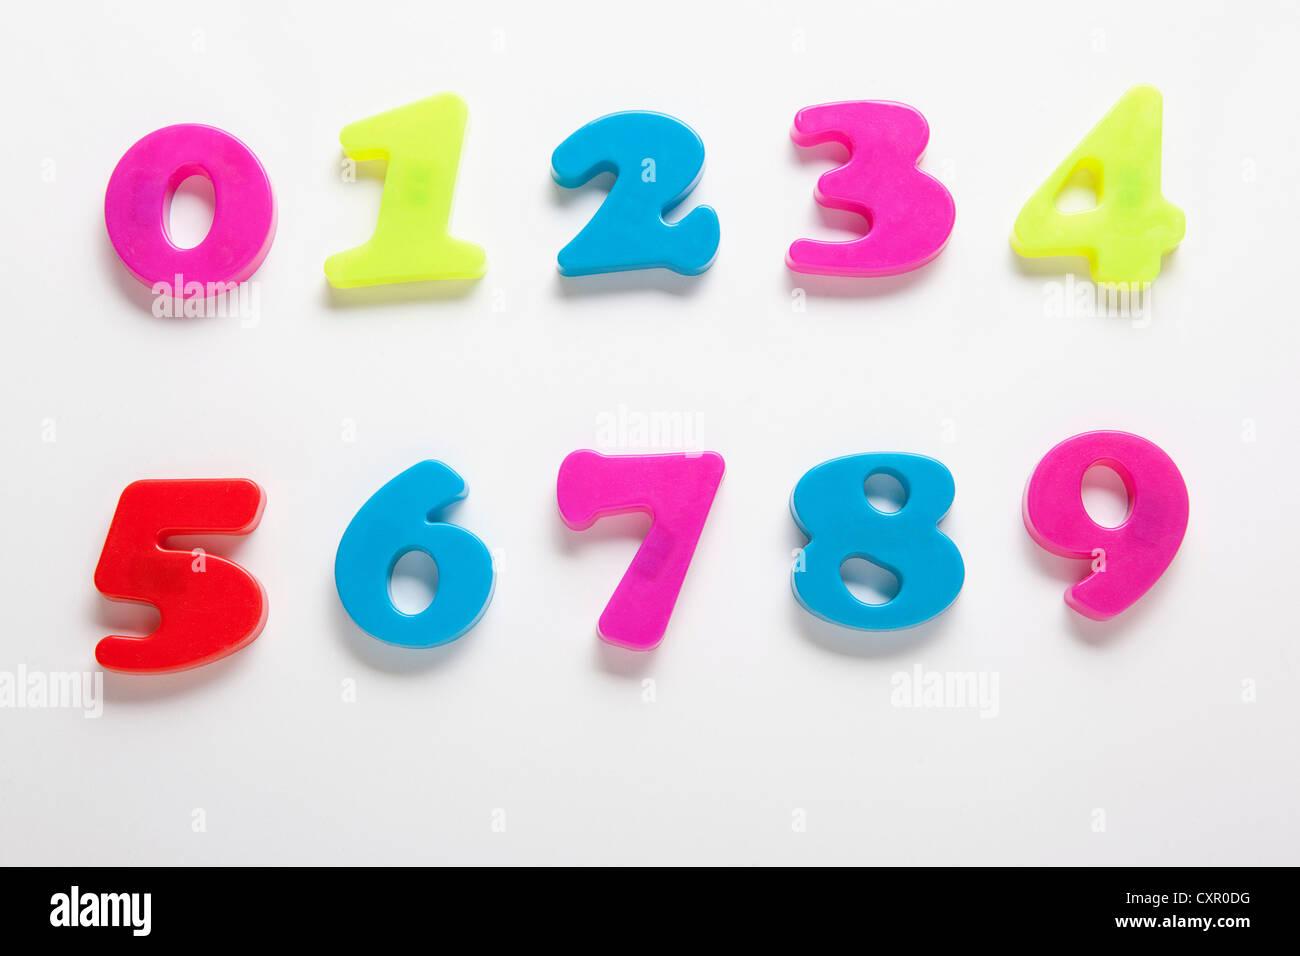 Kühlschrank Magnet Zahlen Stockbild